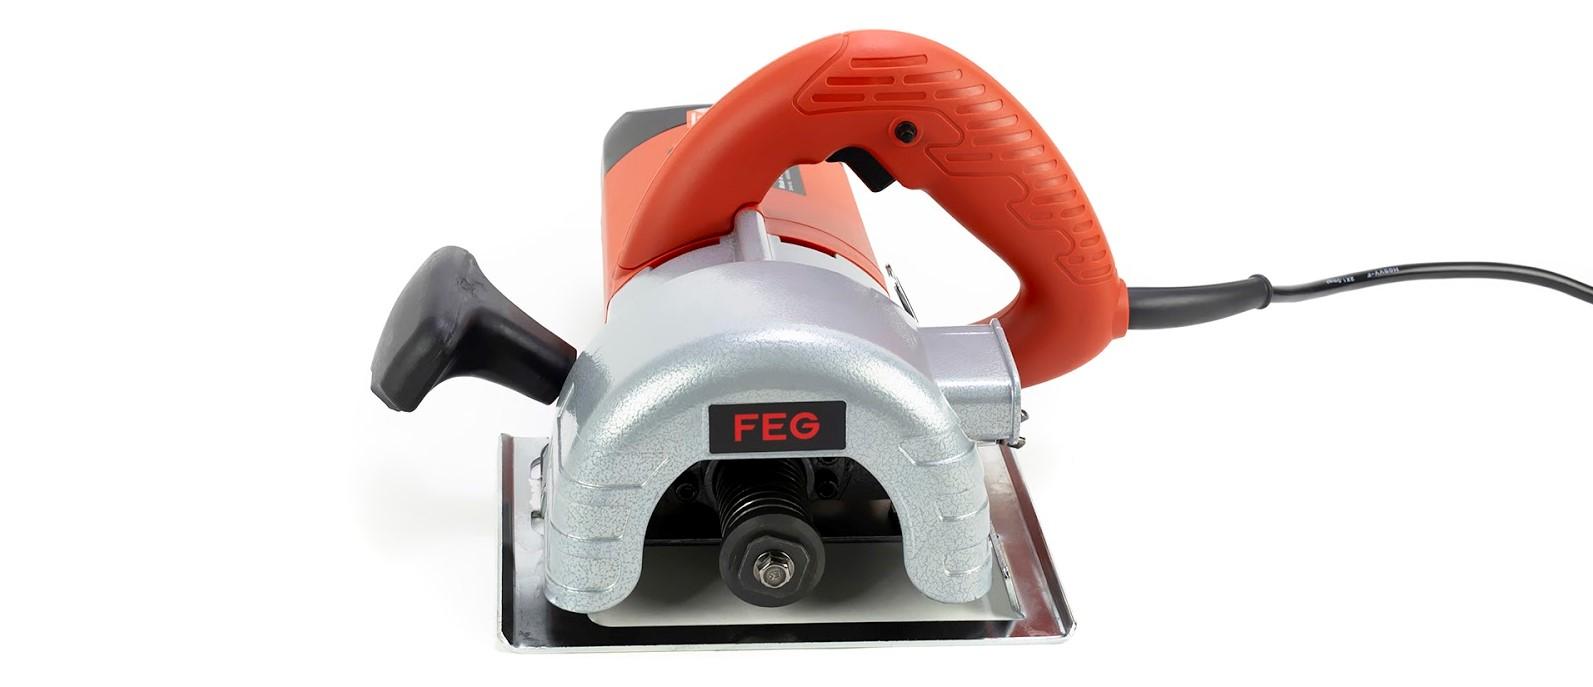 Máy cắt rãnh tường FEG EG-113W-1